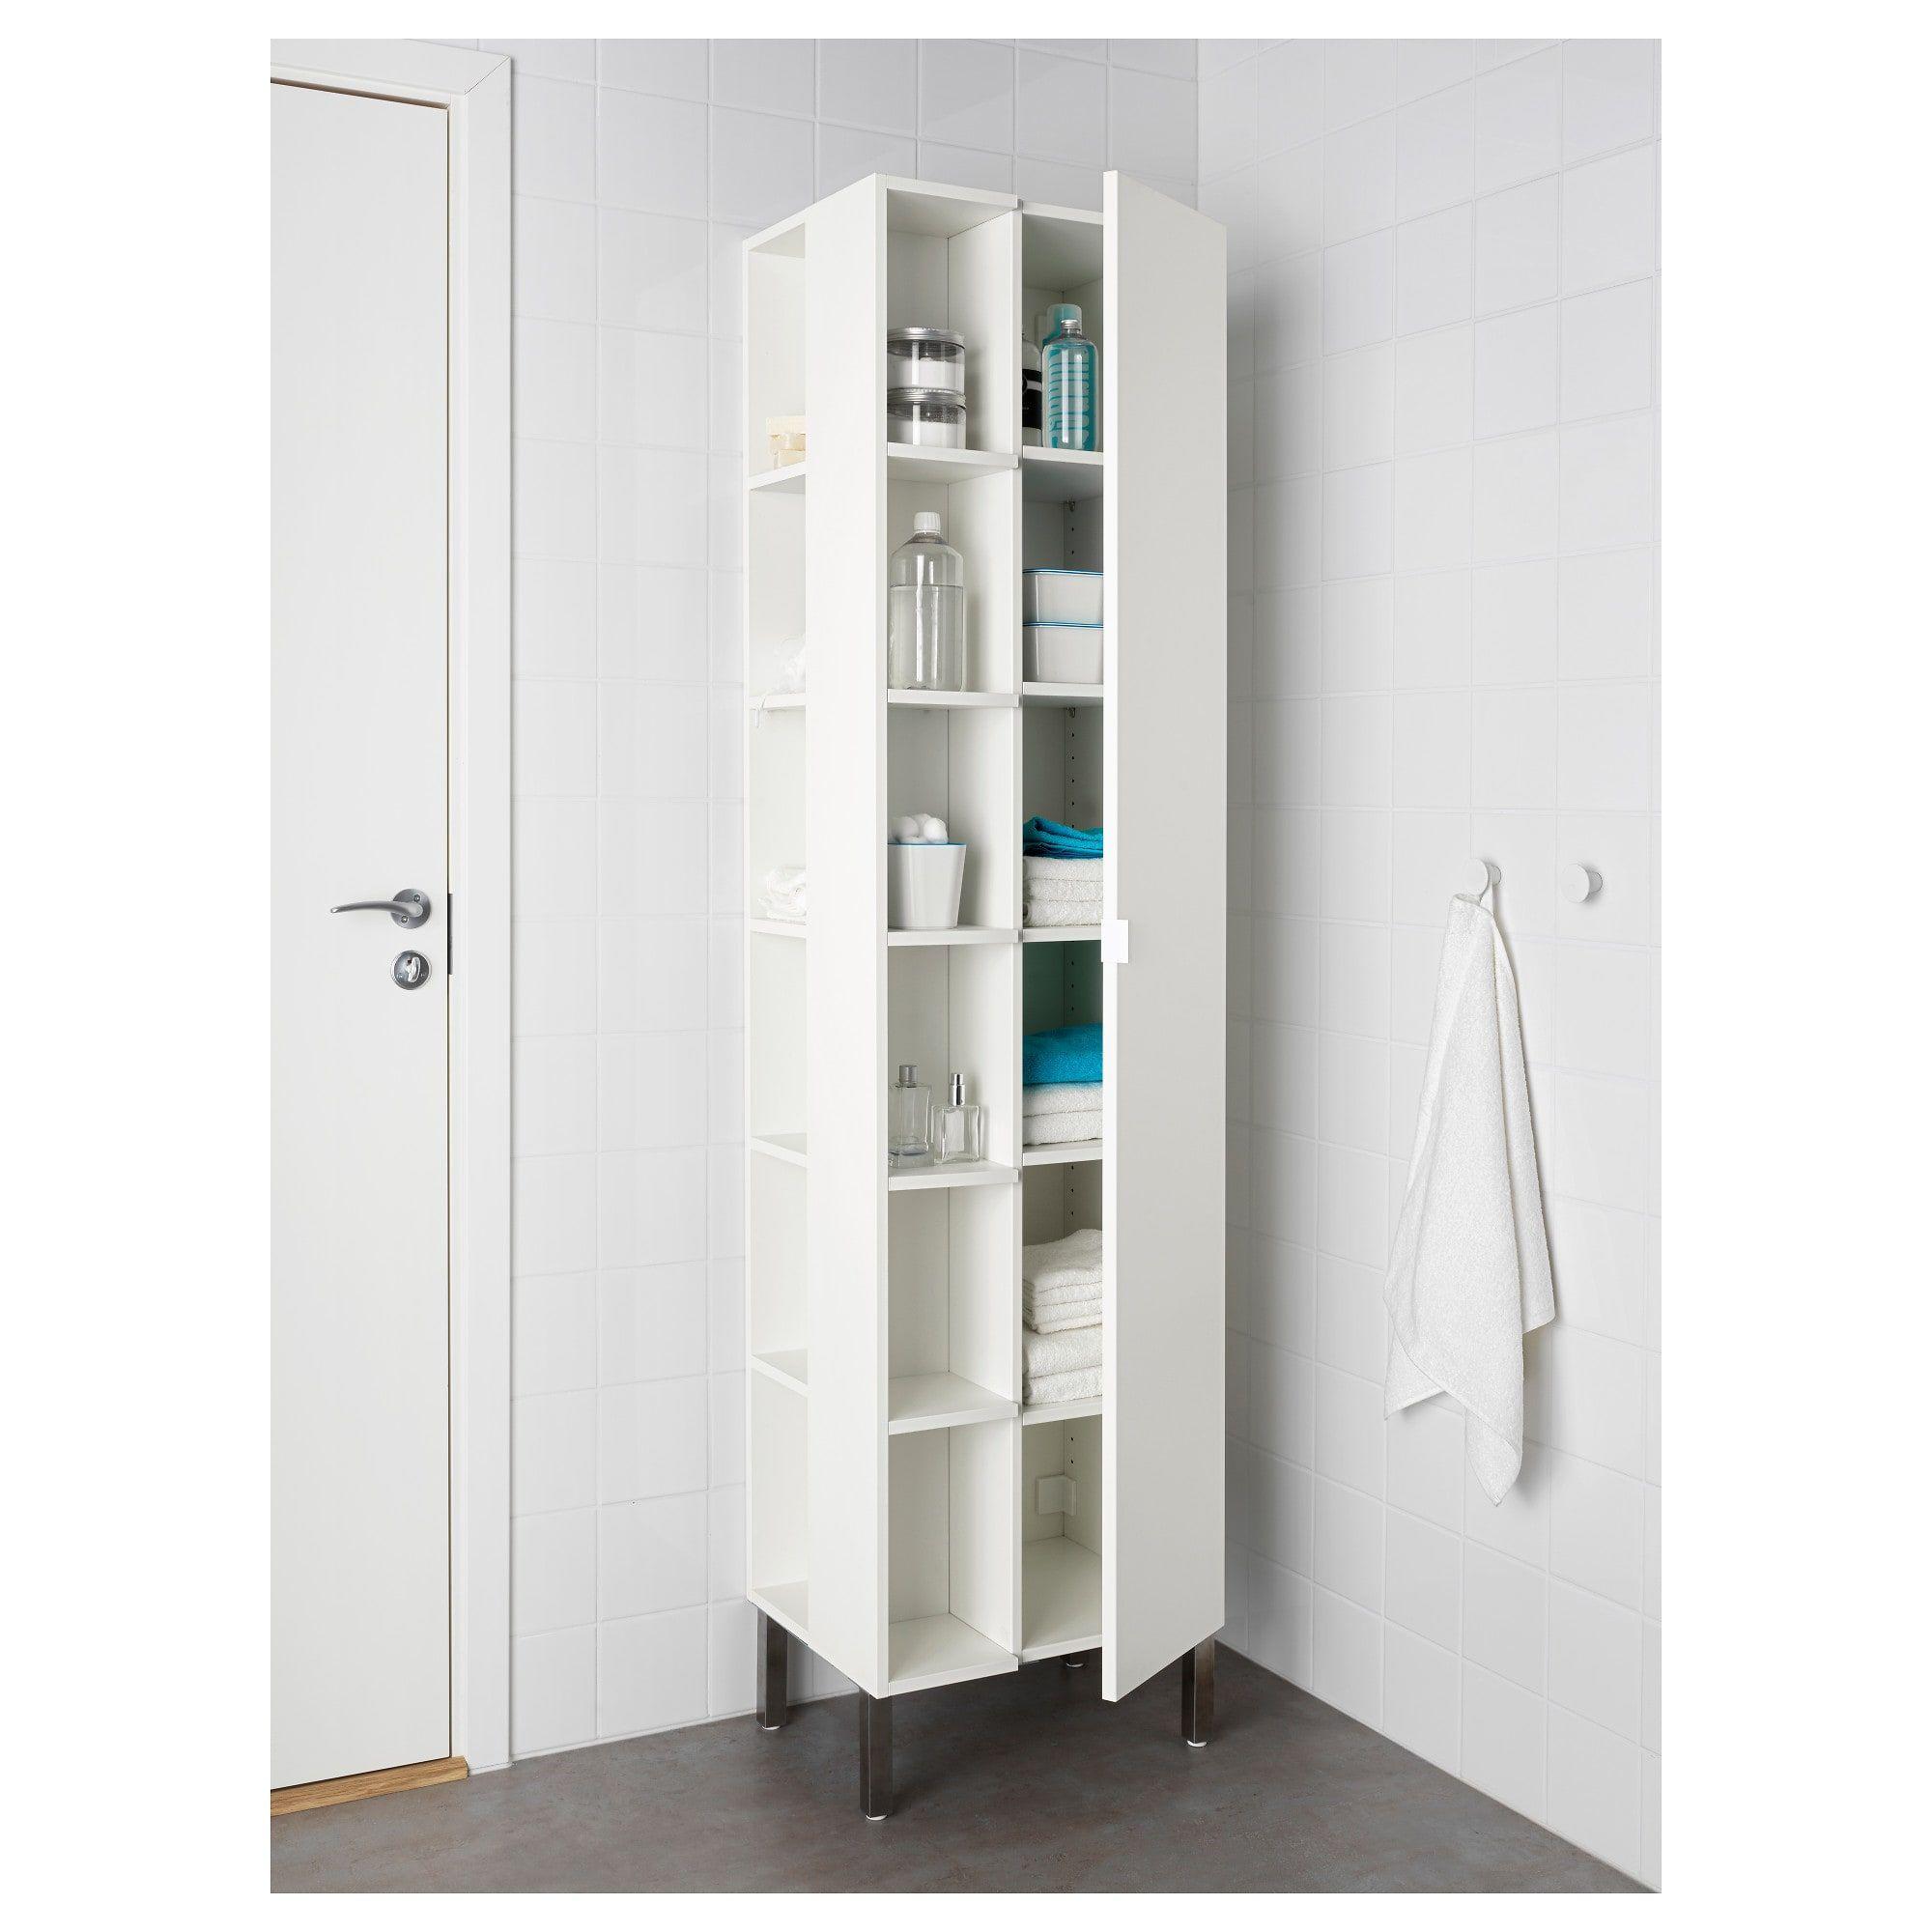 Lillangen Hochschrank 1 Tur 2 Abschlussregale Weiss Ikea